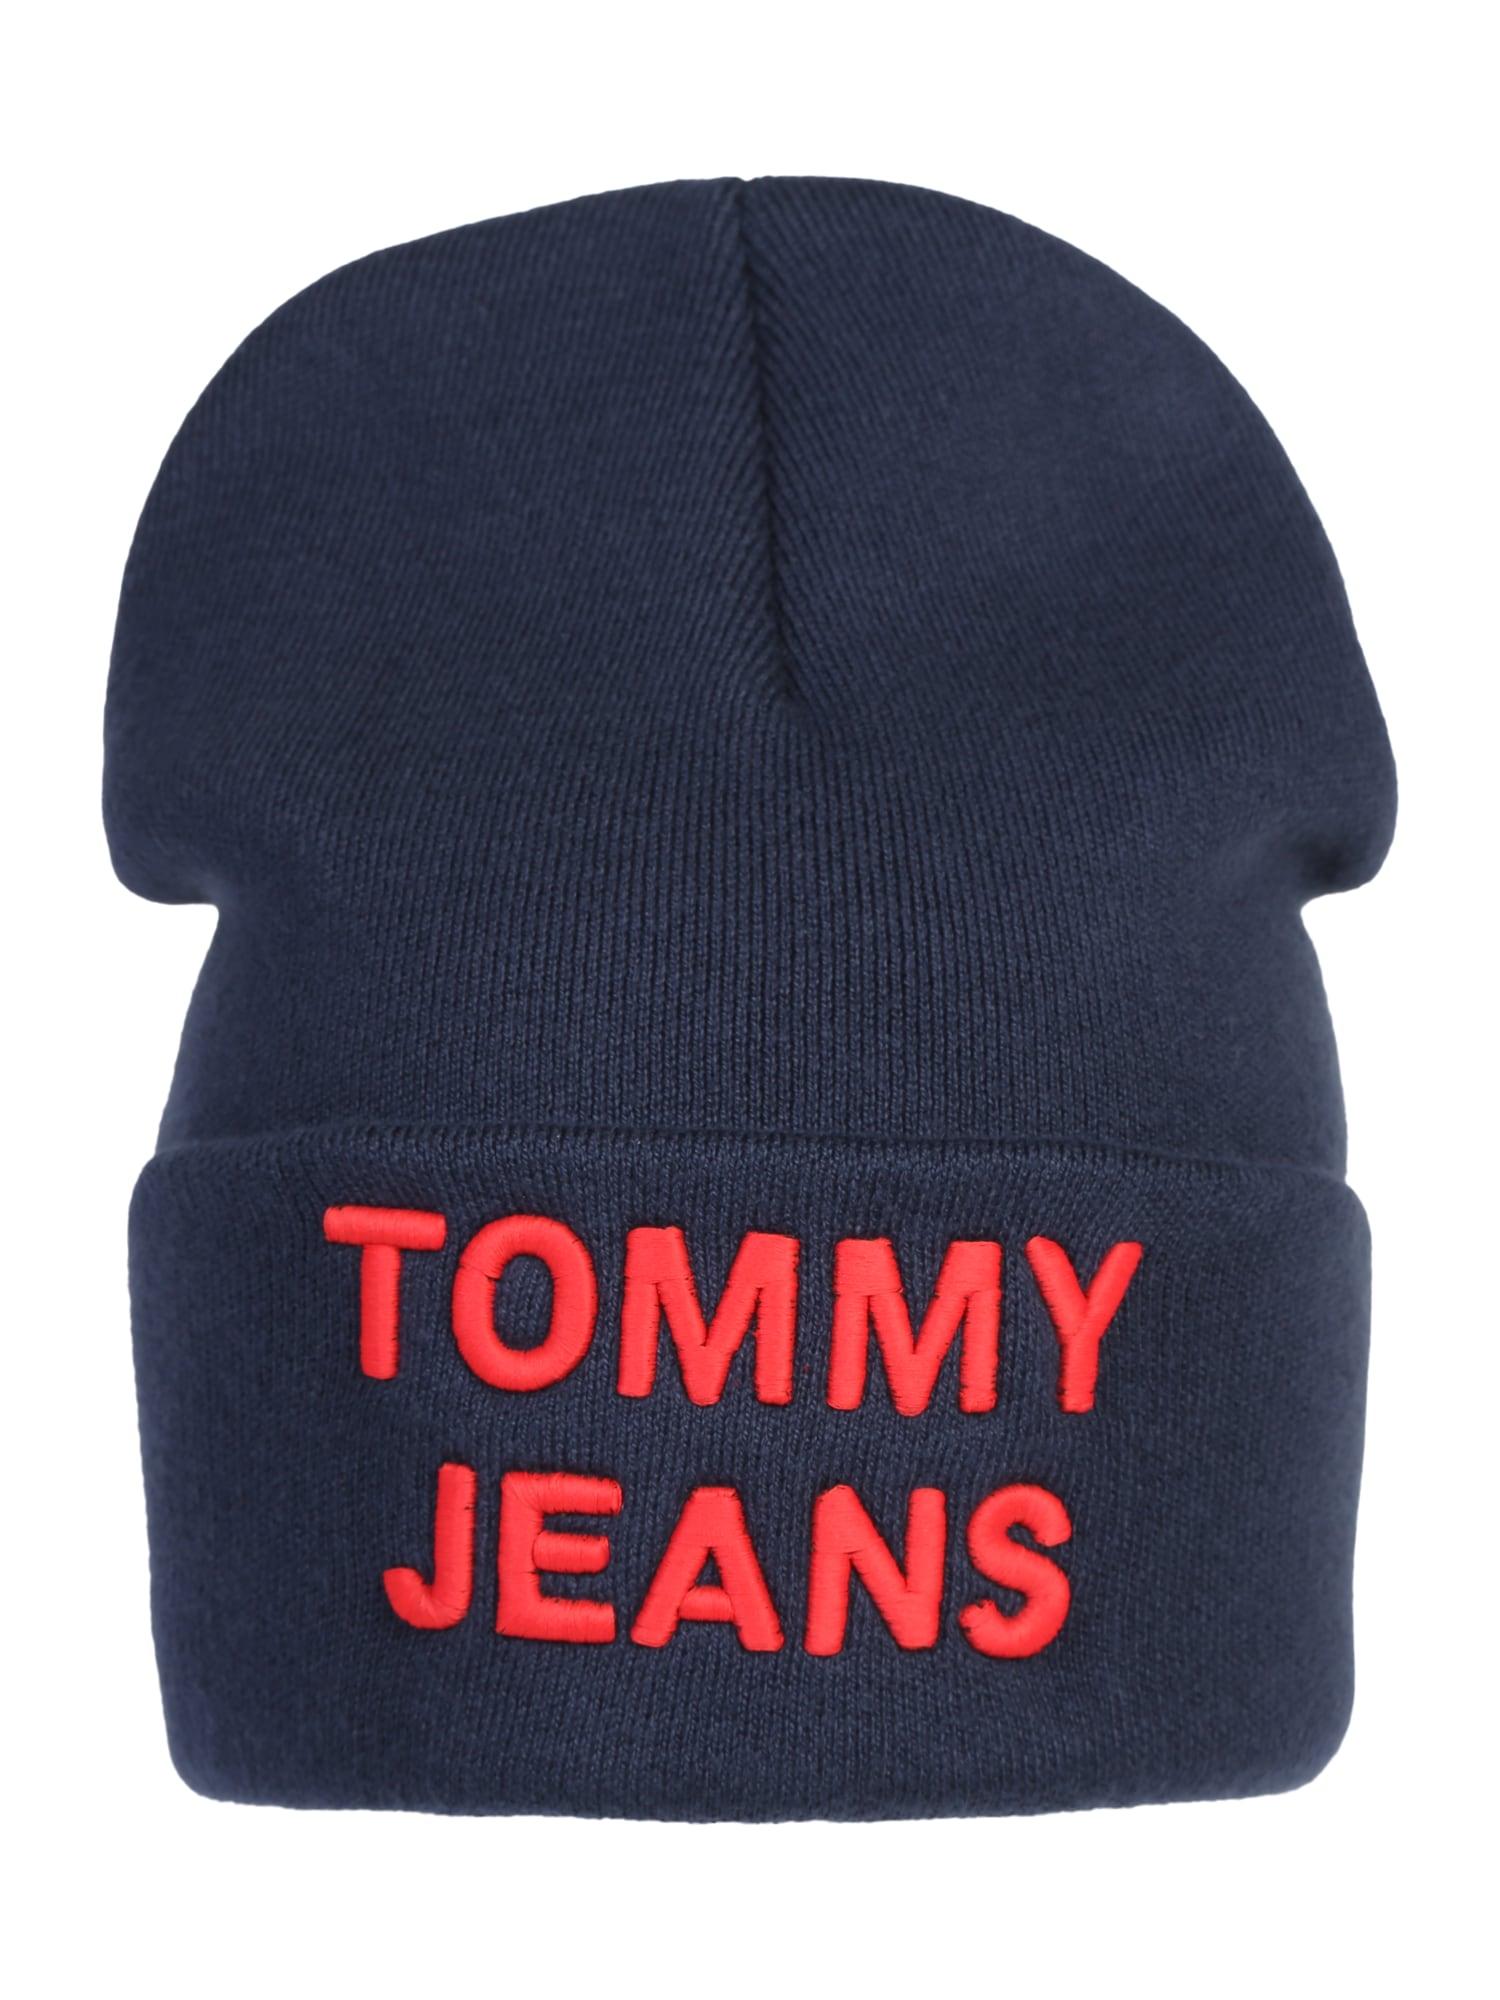 Mütze | Accessoires > Mützen | Tommy Jeans